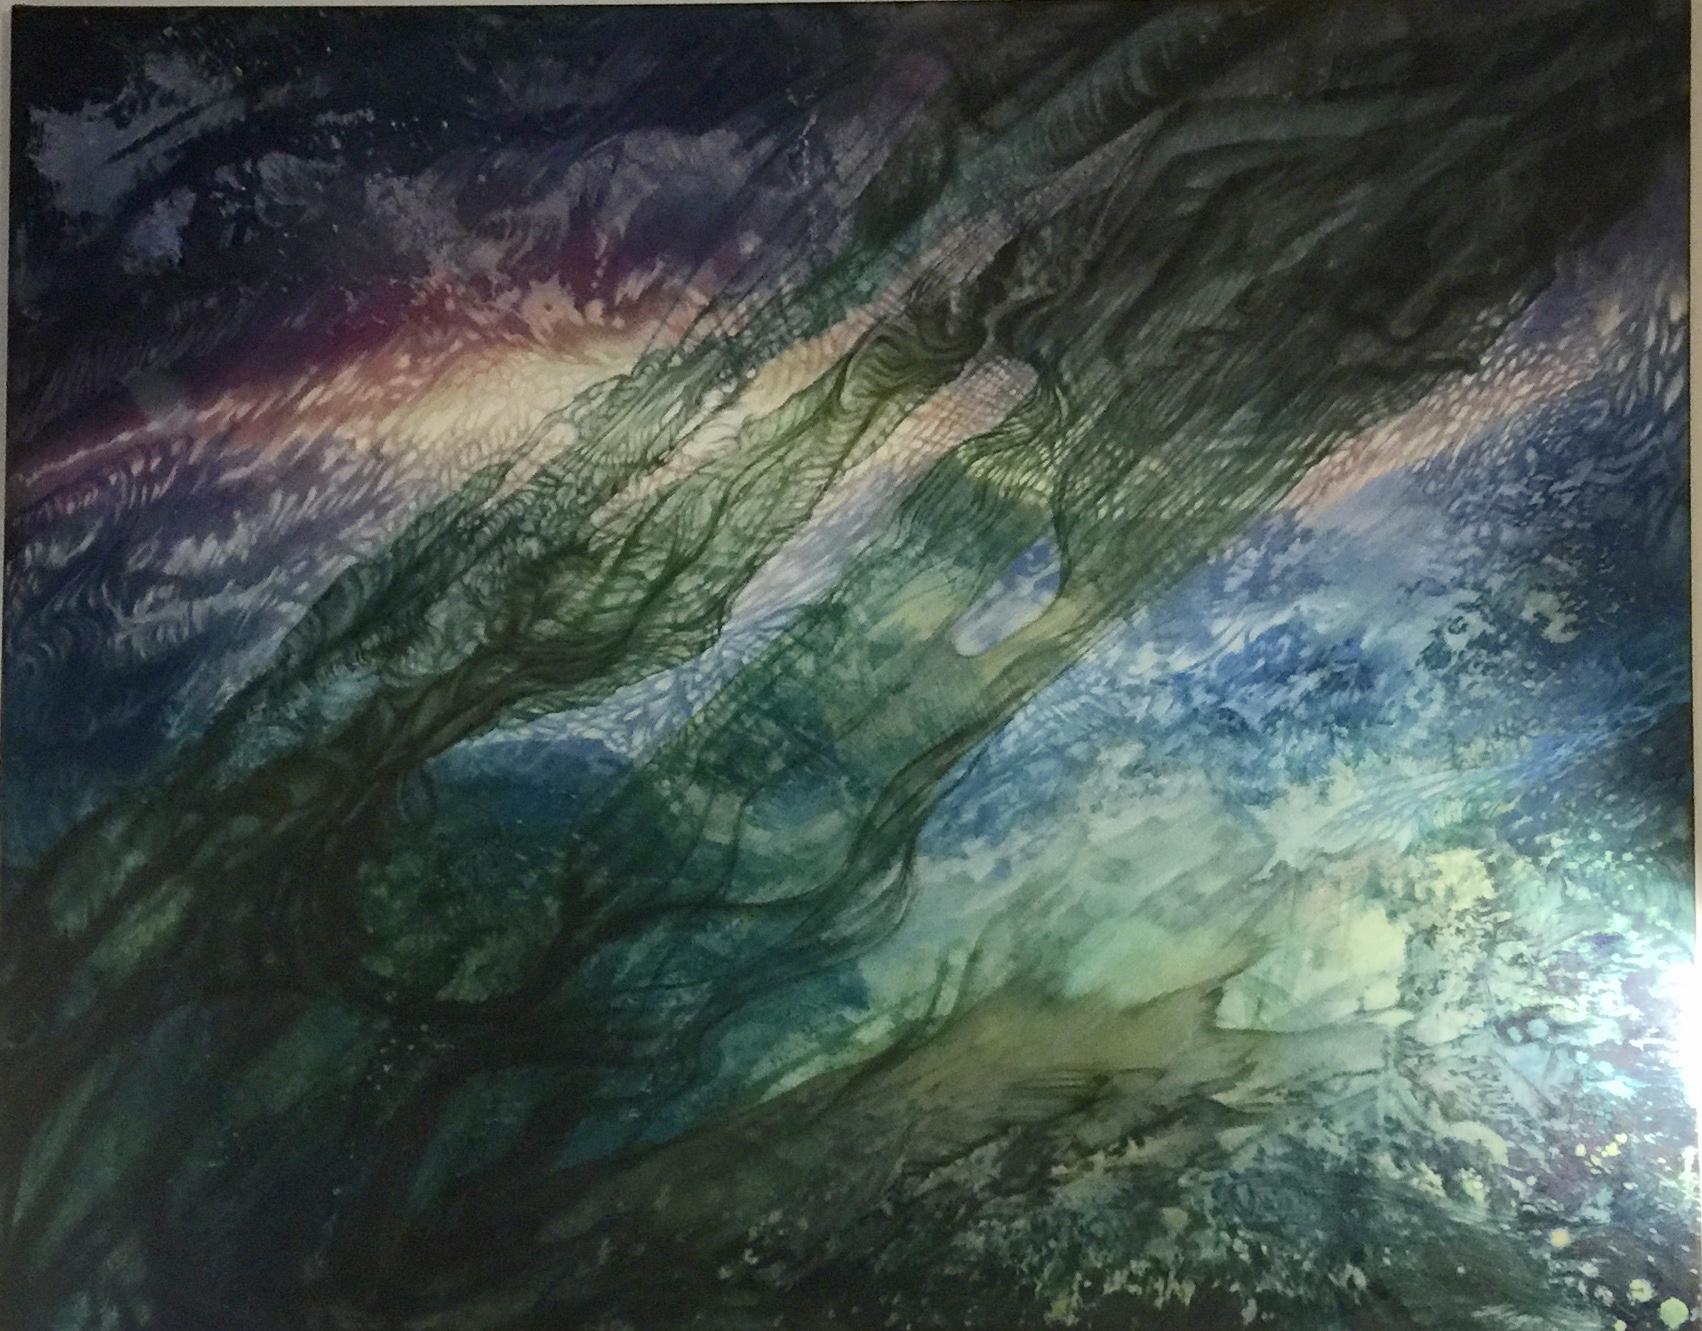 Solarplexus skyfall